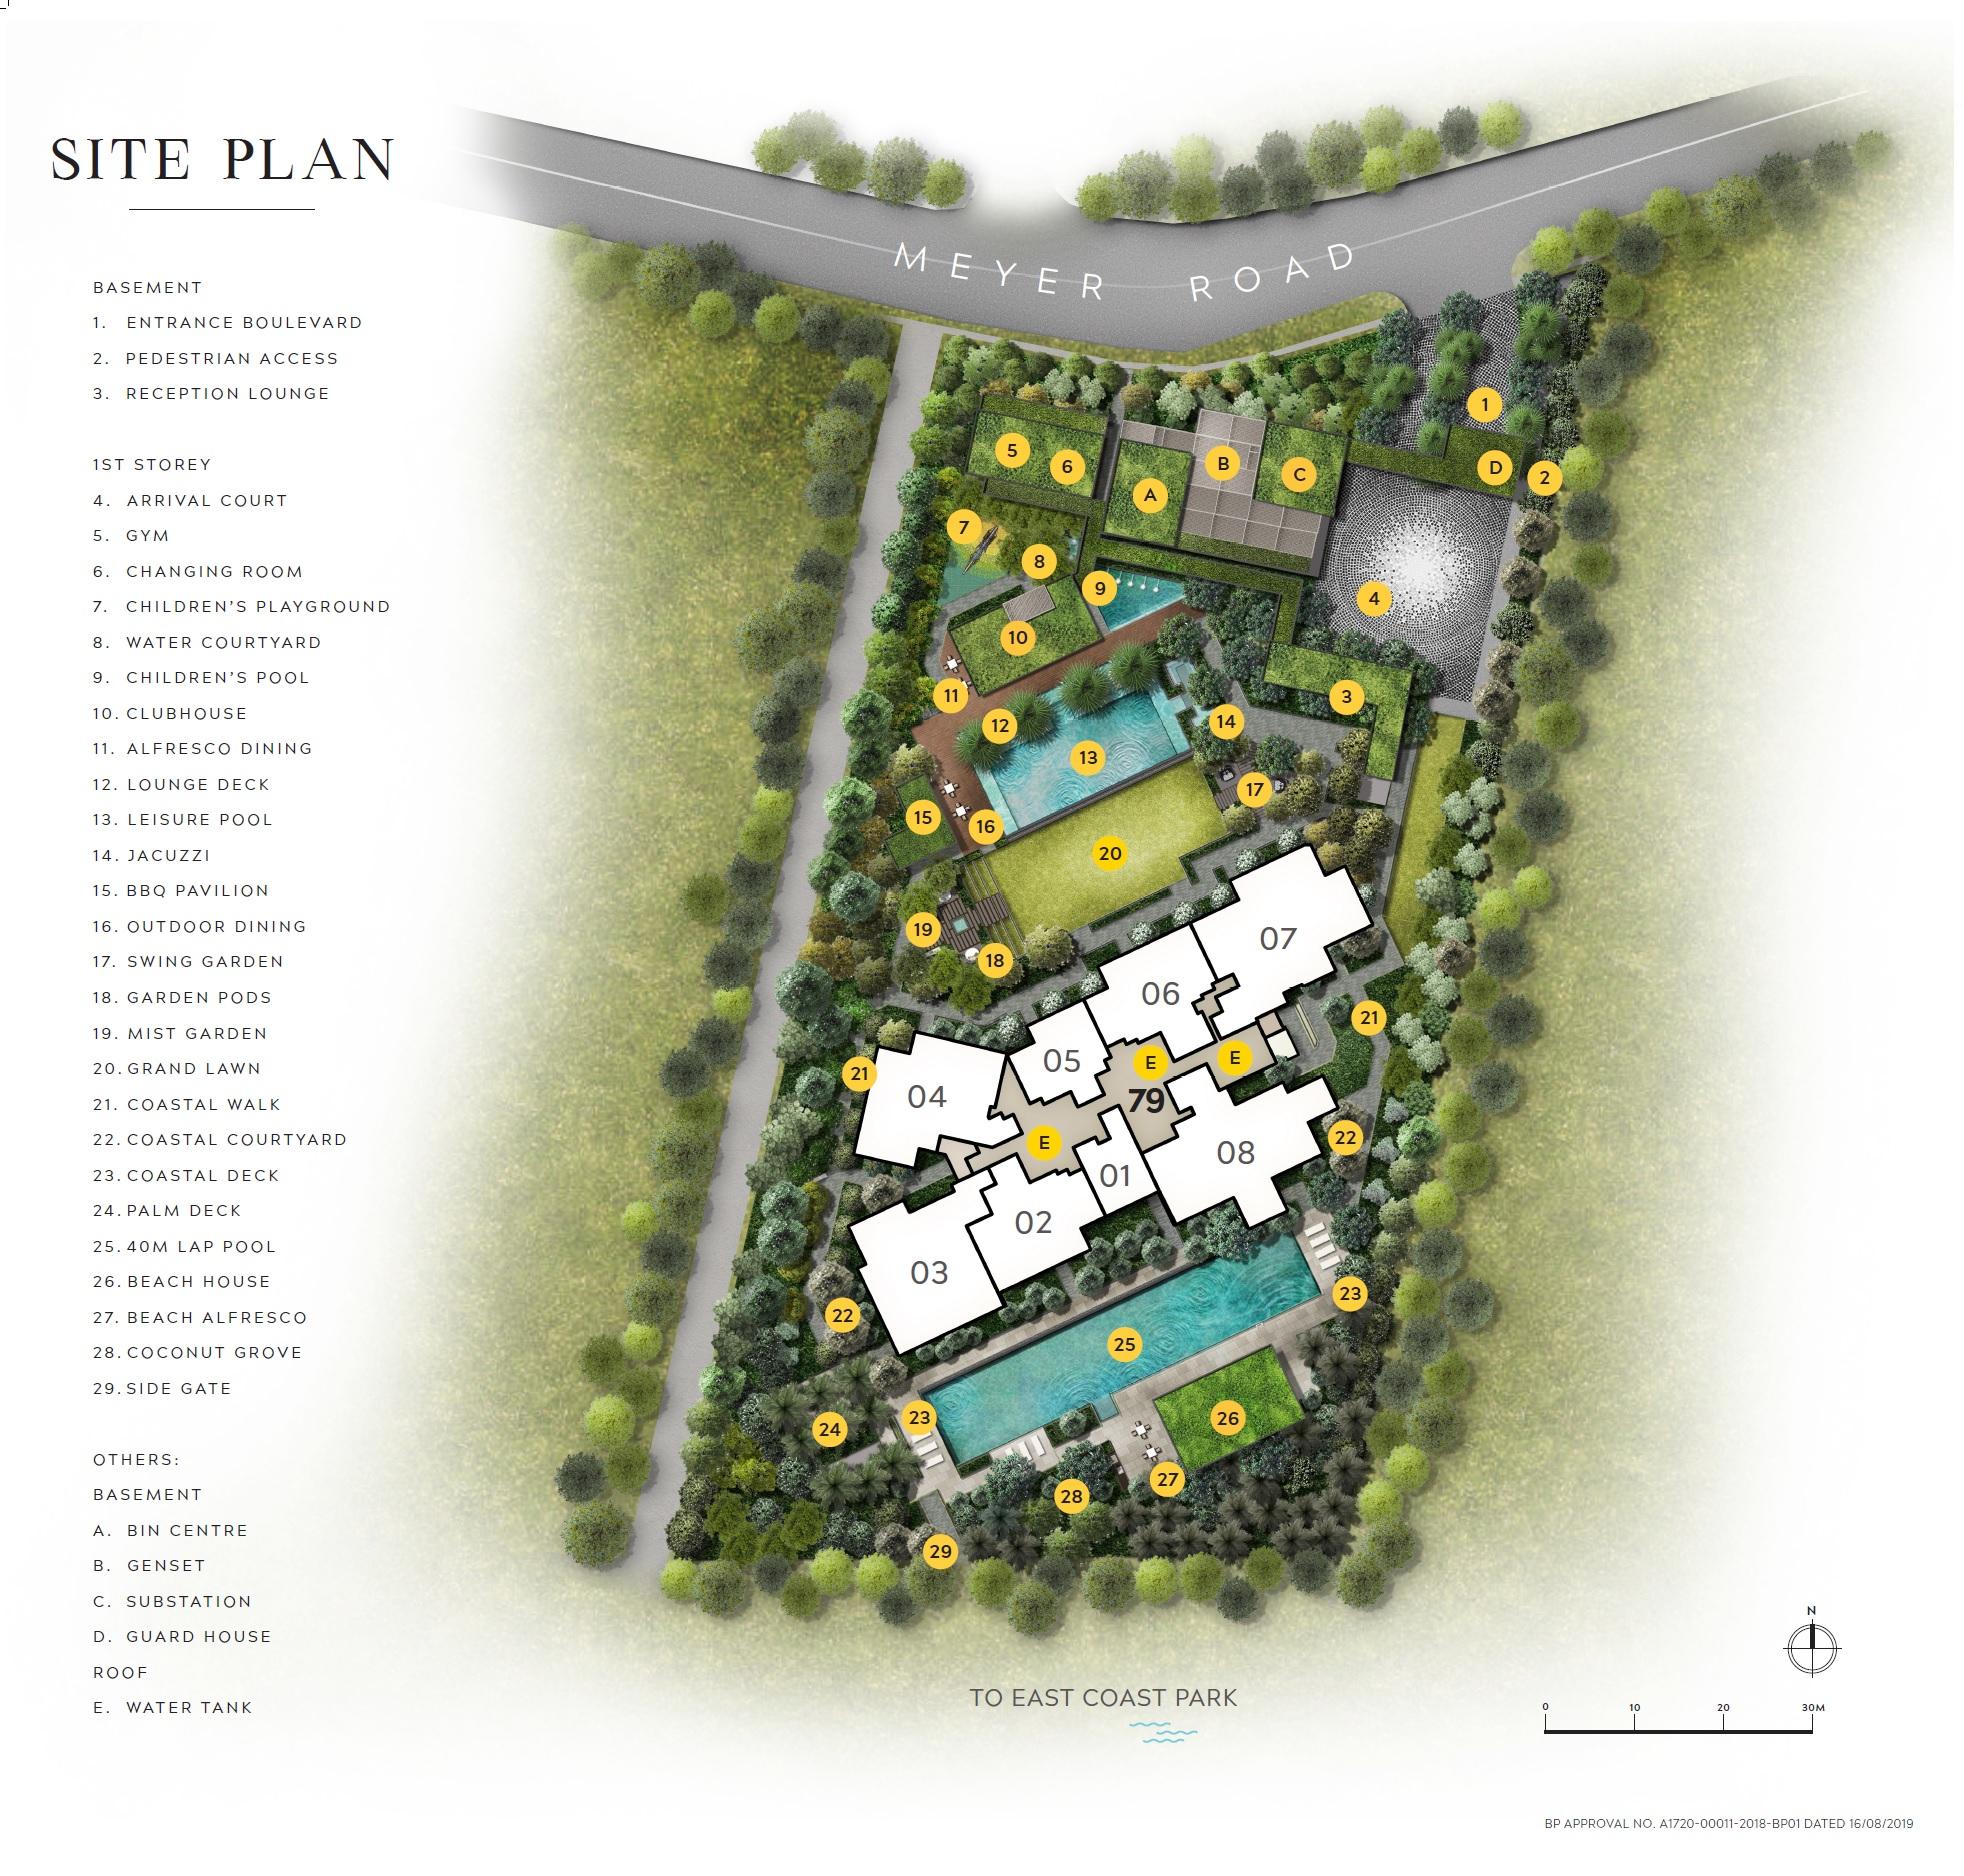 Meyer Mansion (美雅豪苑) site plan